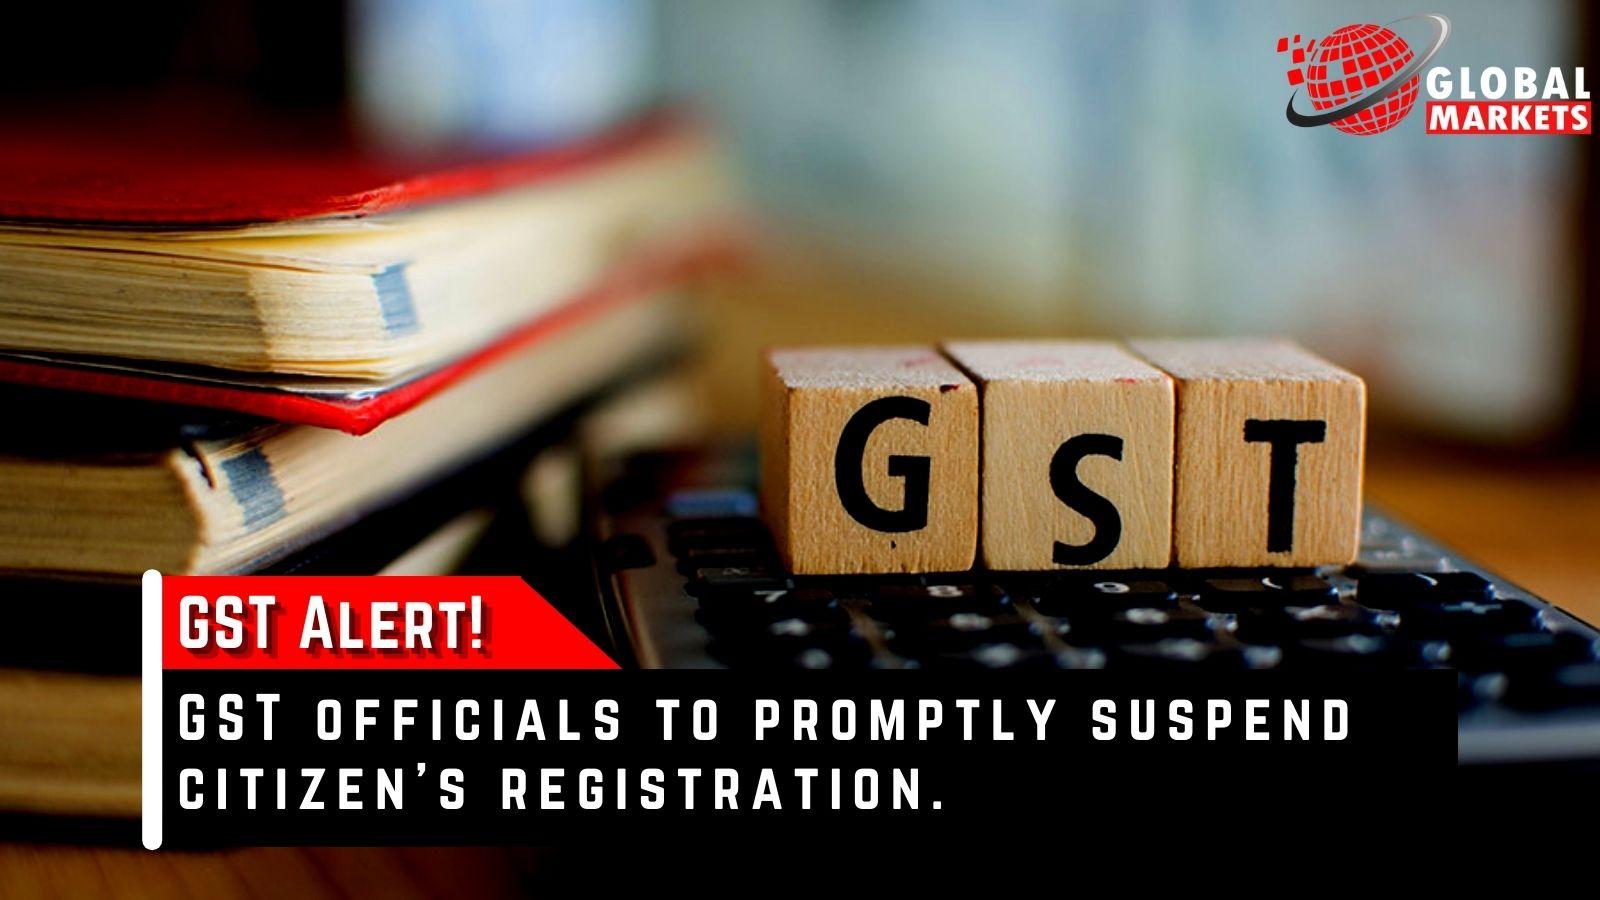 GST Alert! GST officials to promptly suspend citizen's registration.